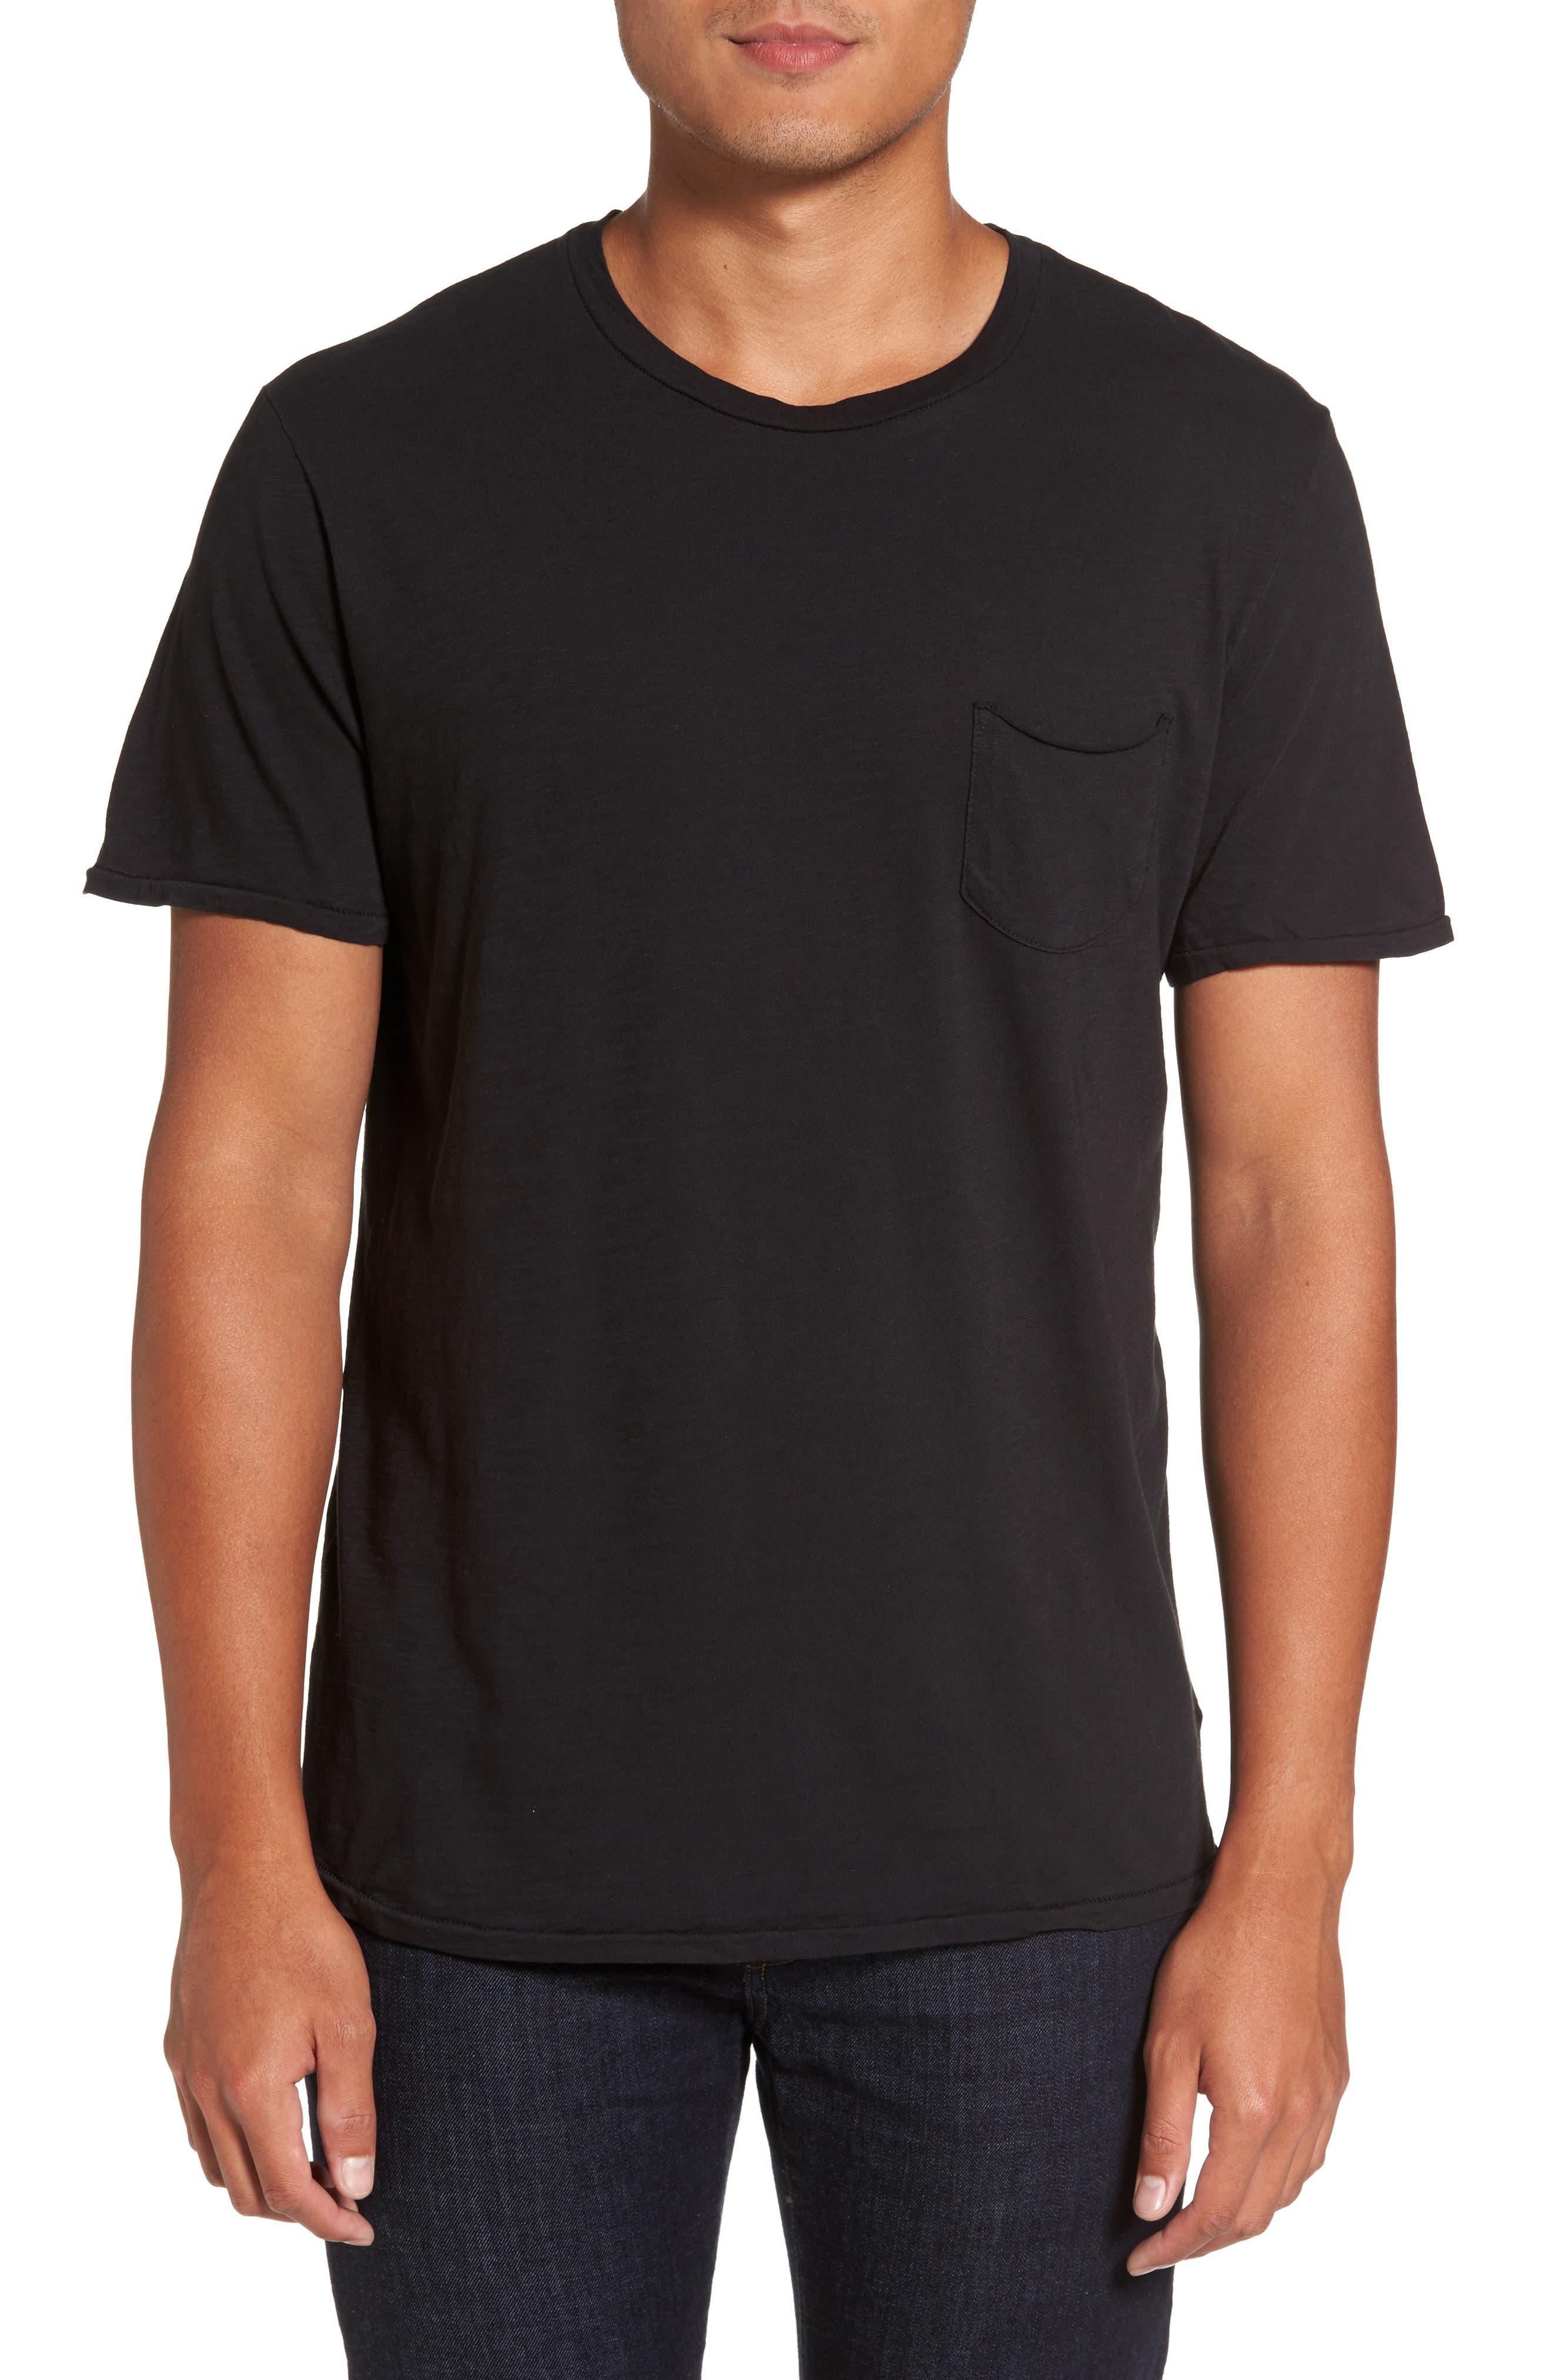 Joe's Chase Classic Crewneck T-Shirt